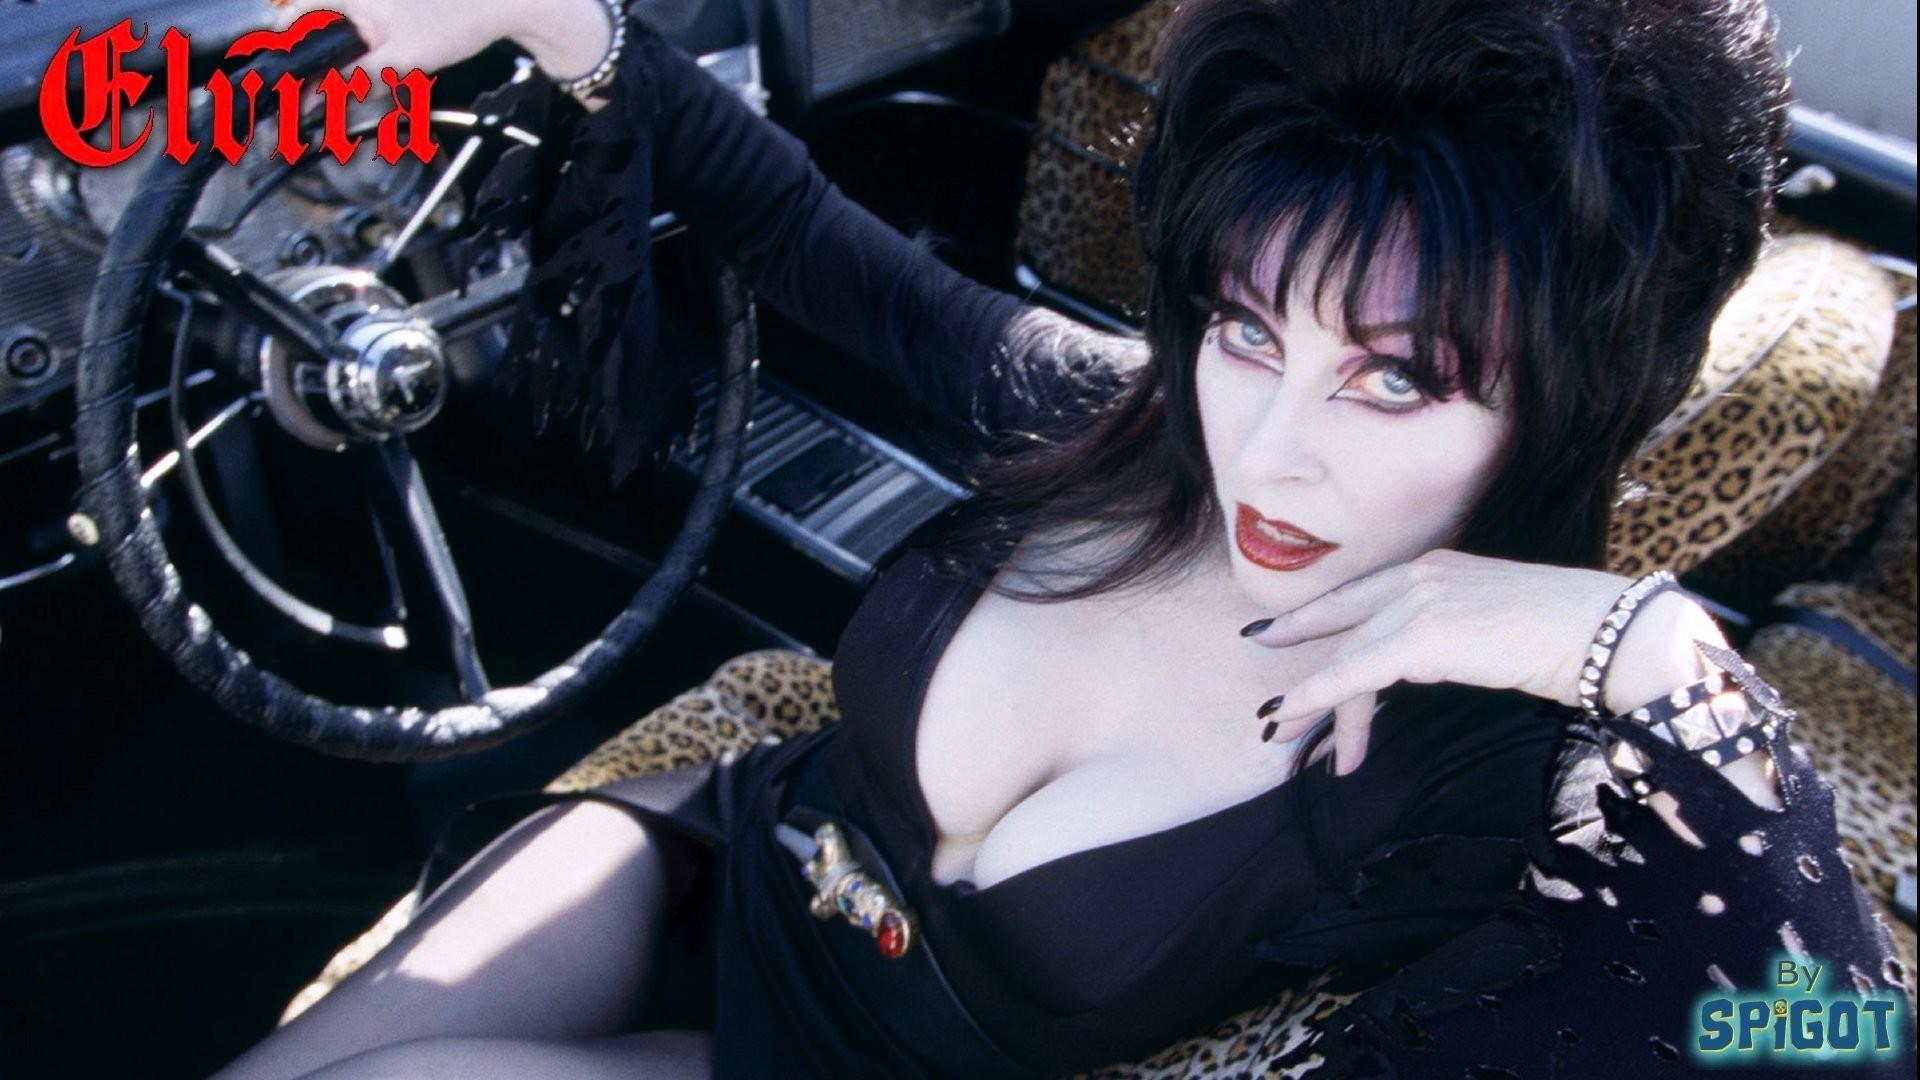 Elvira images Elvira HD wallpaper and background photos